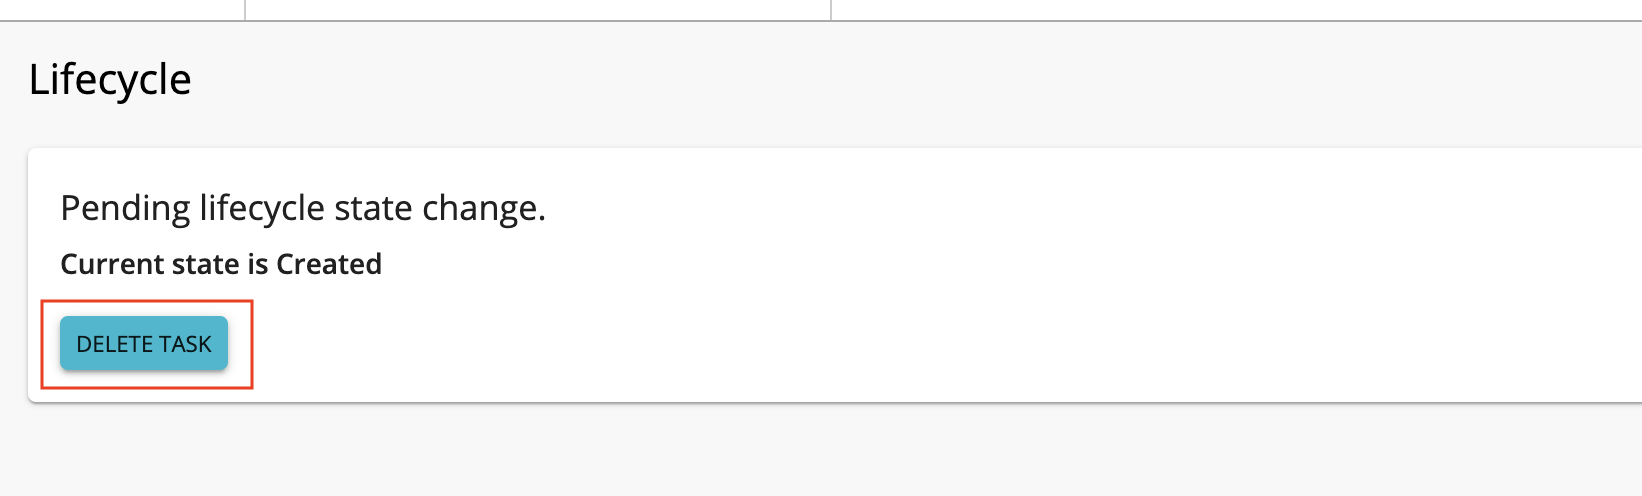 Delete task button